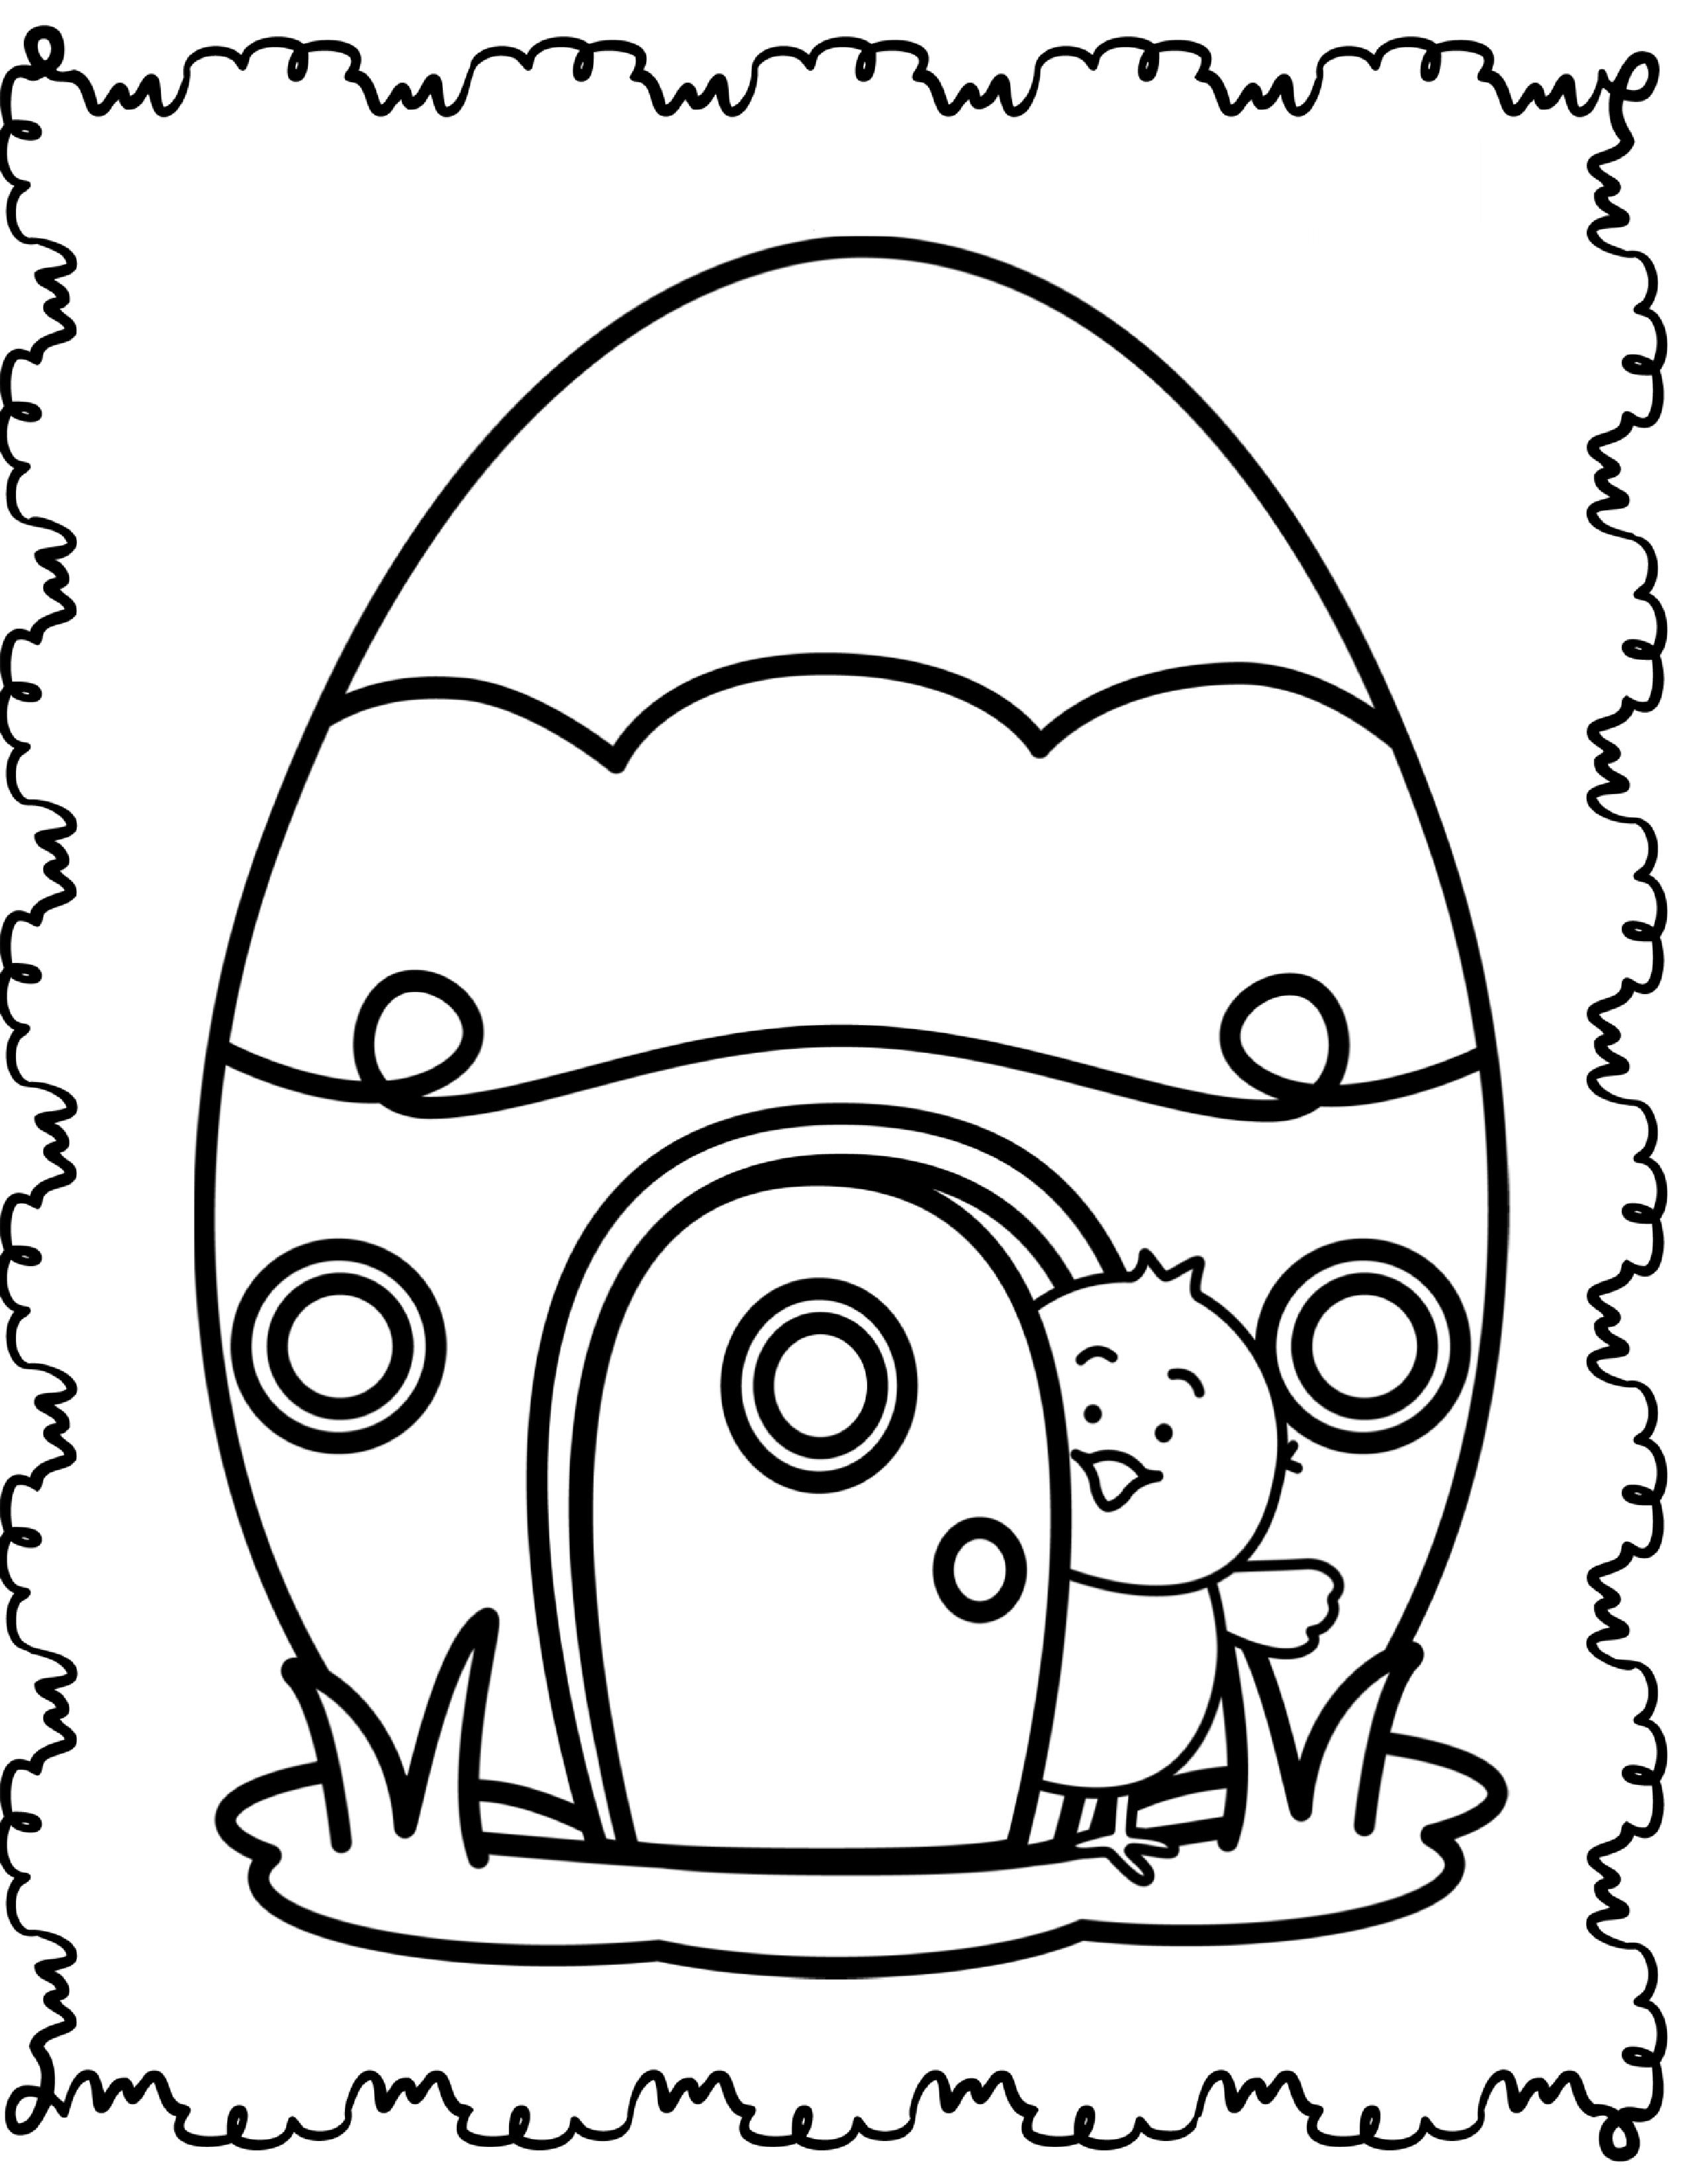 Easter crafts easter crafts u coloring pages pinterest easter